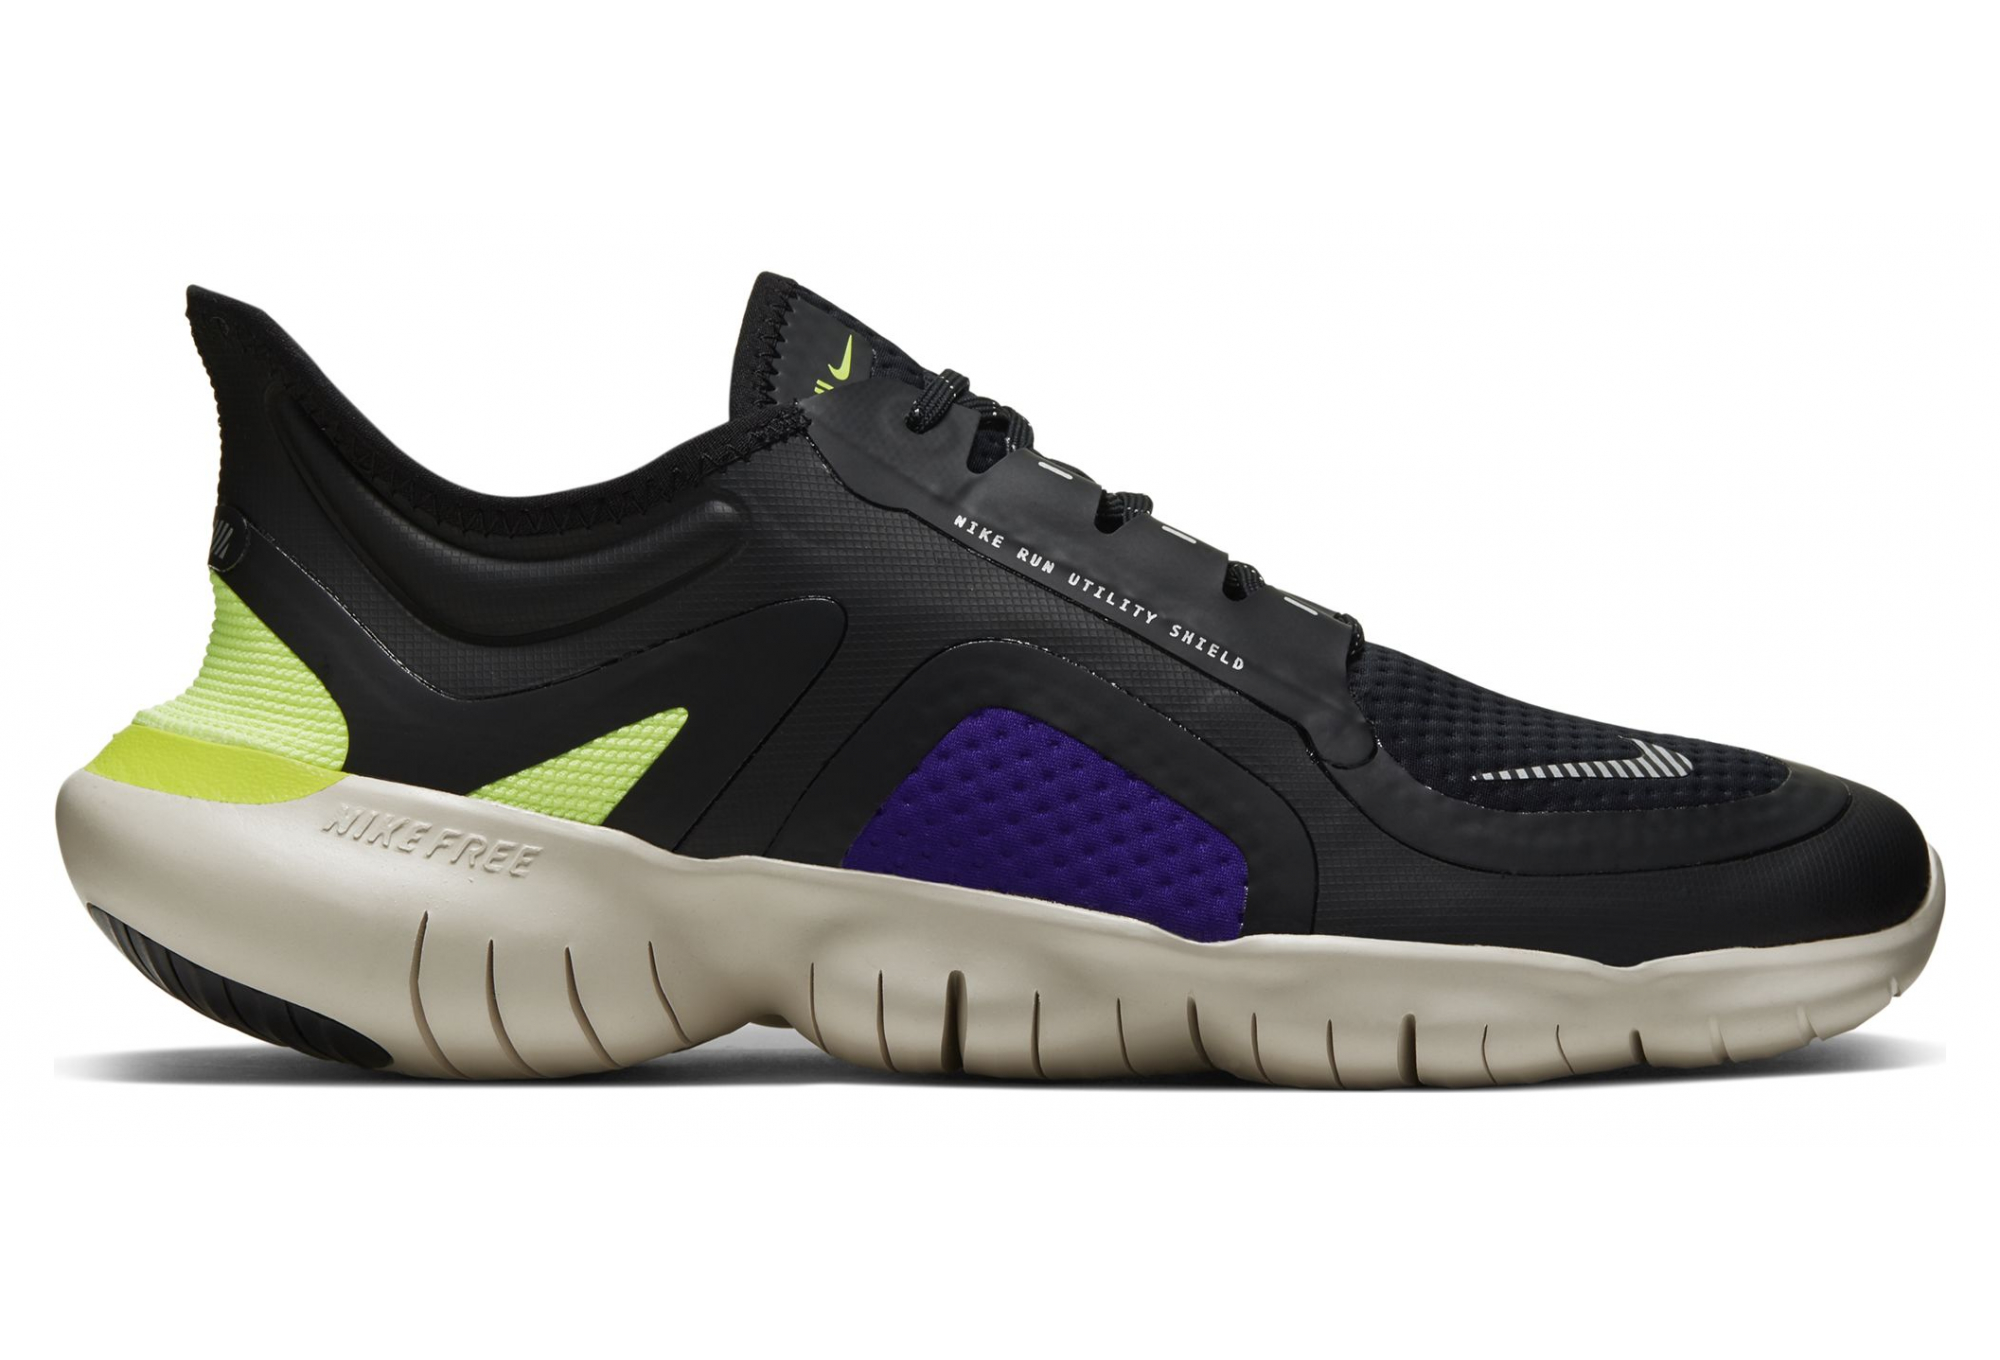 Chaussures de Running Homme NIKE Free RN 5.0 Shield Noir Jaune Violet